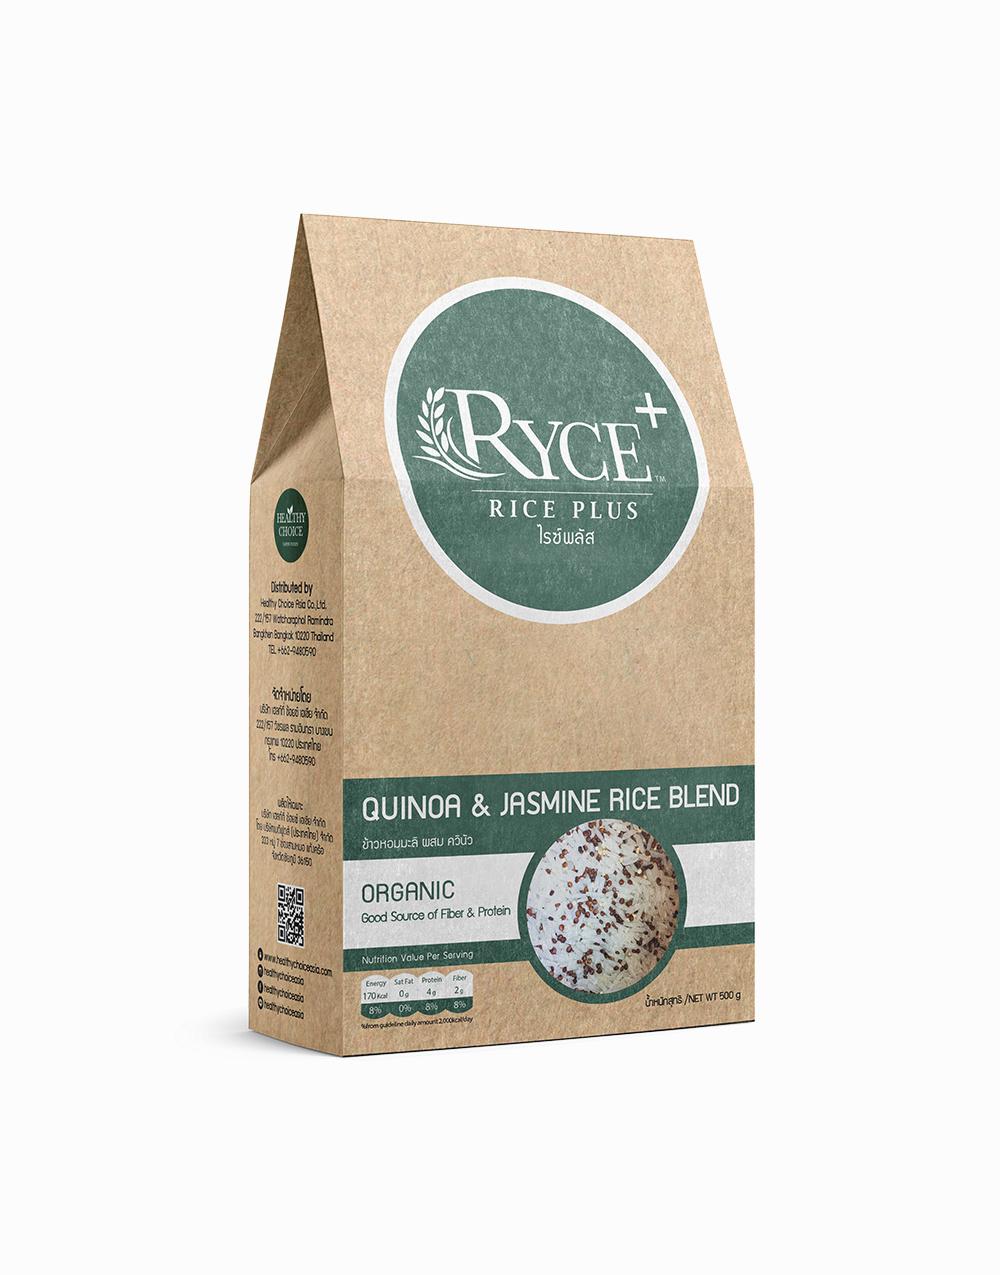 Quinoa & Jasmine Rice Blend (500g) by Healthy Choice PH